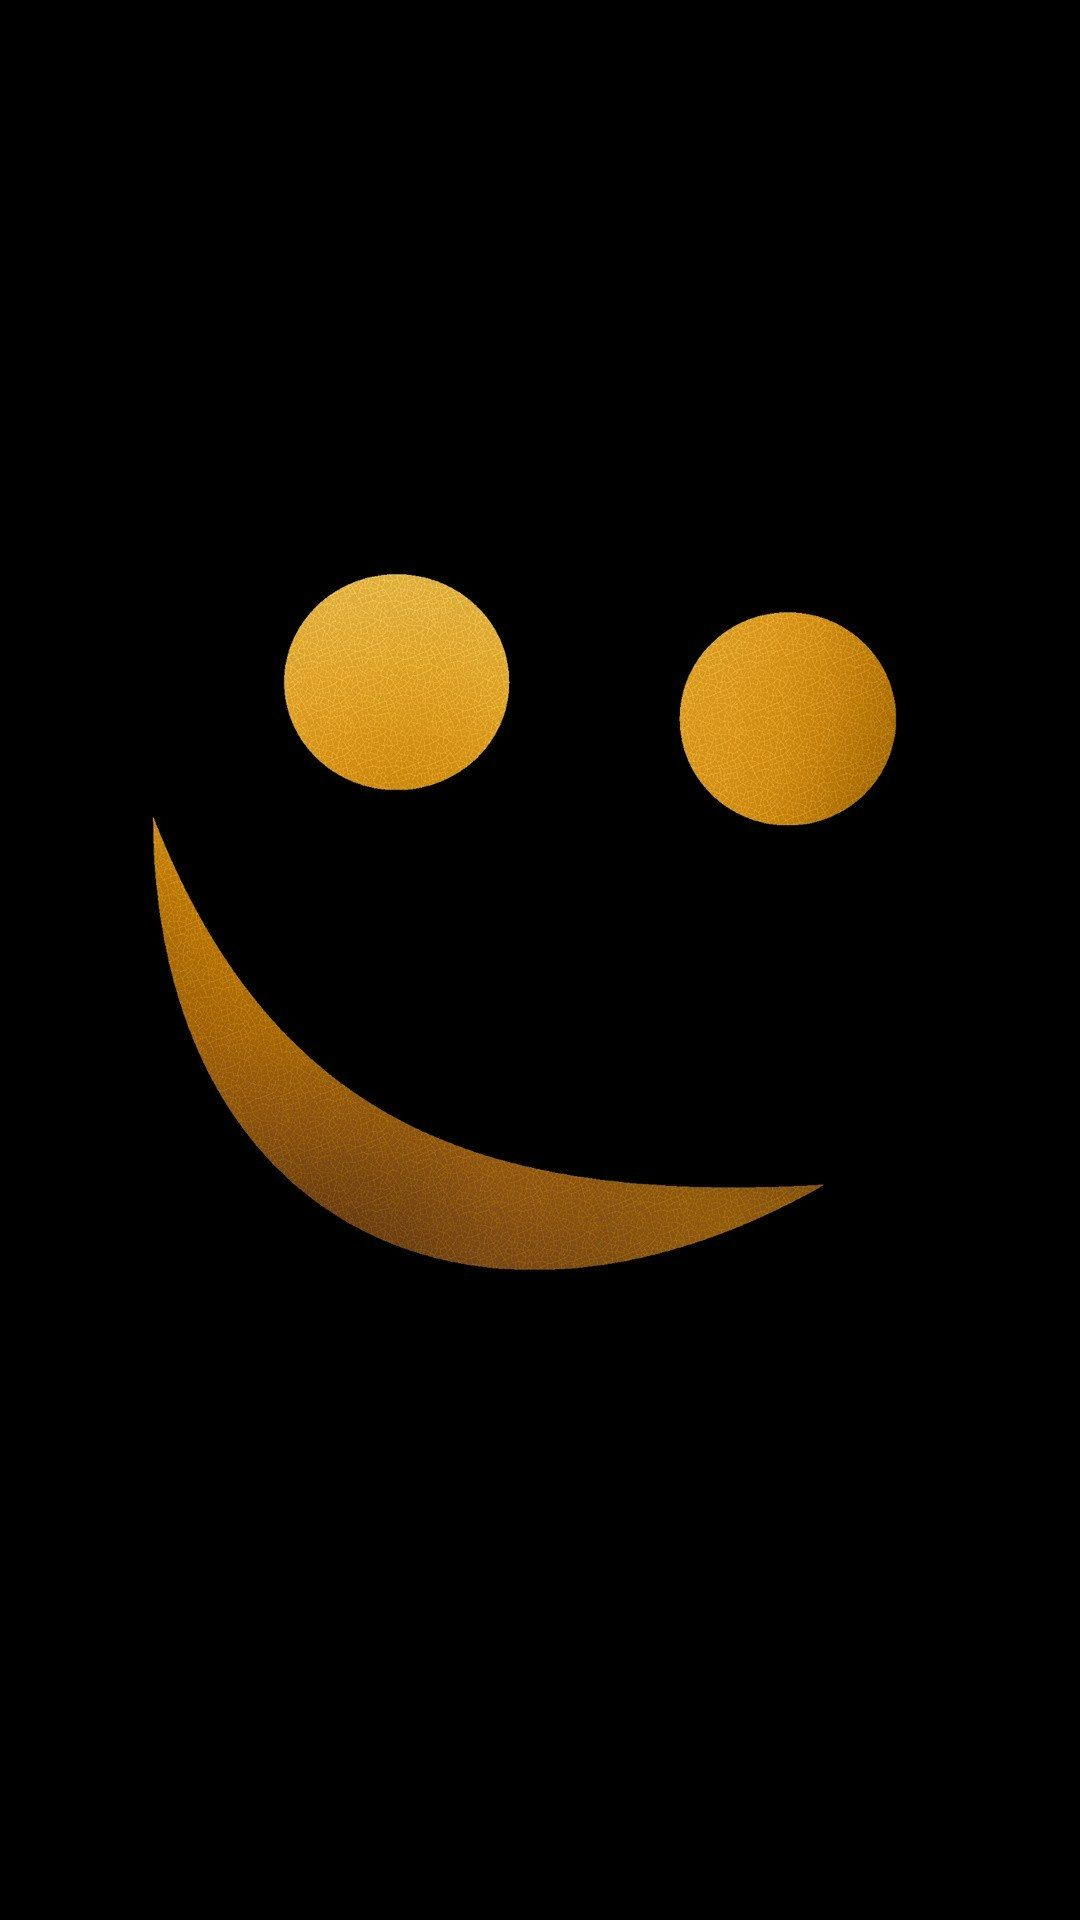 Pin By Rafailhabib On M Best Iphone Wallpapers Emoji Wallpaper Smile Wallpaper